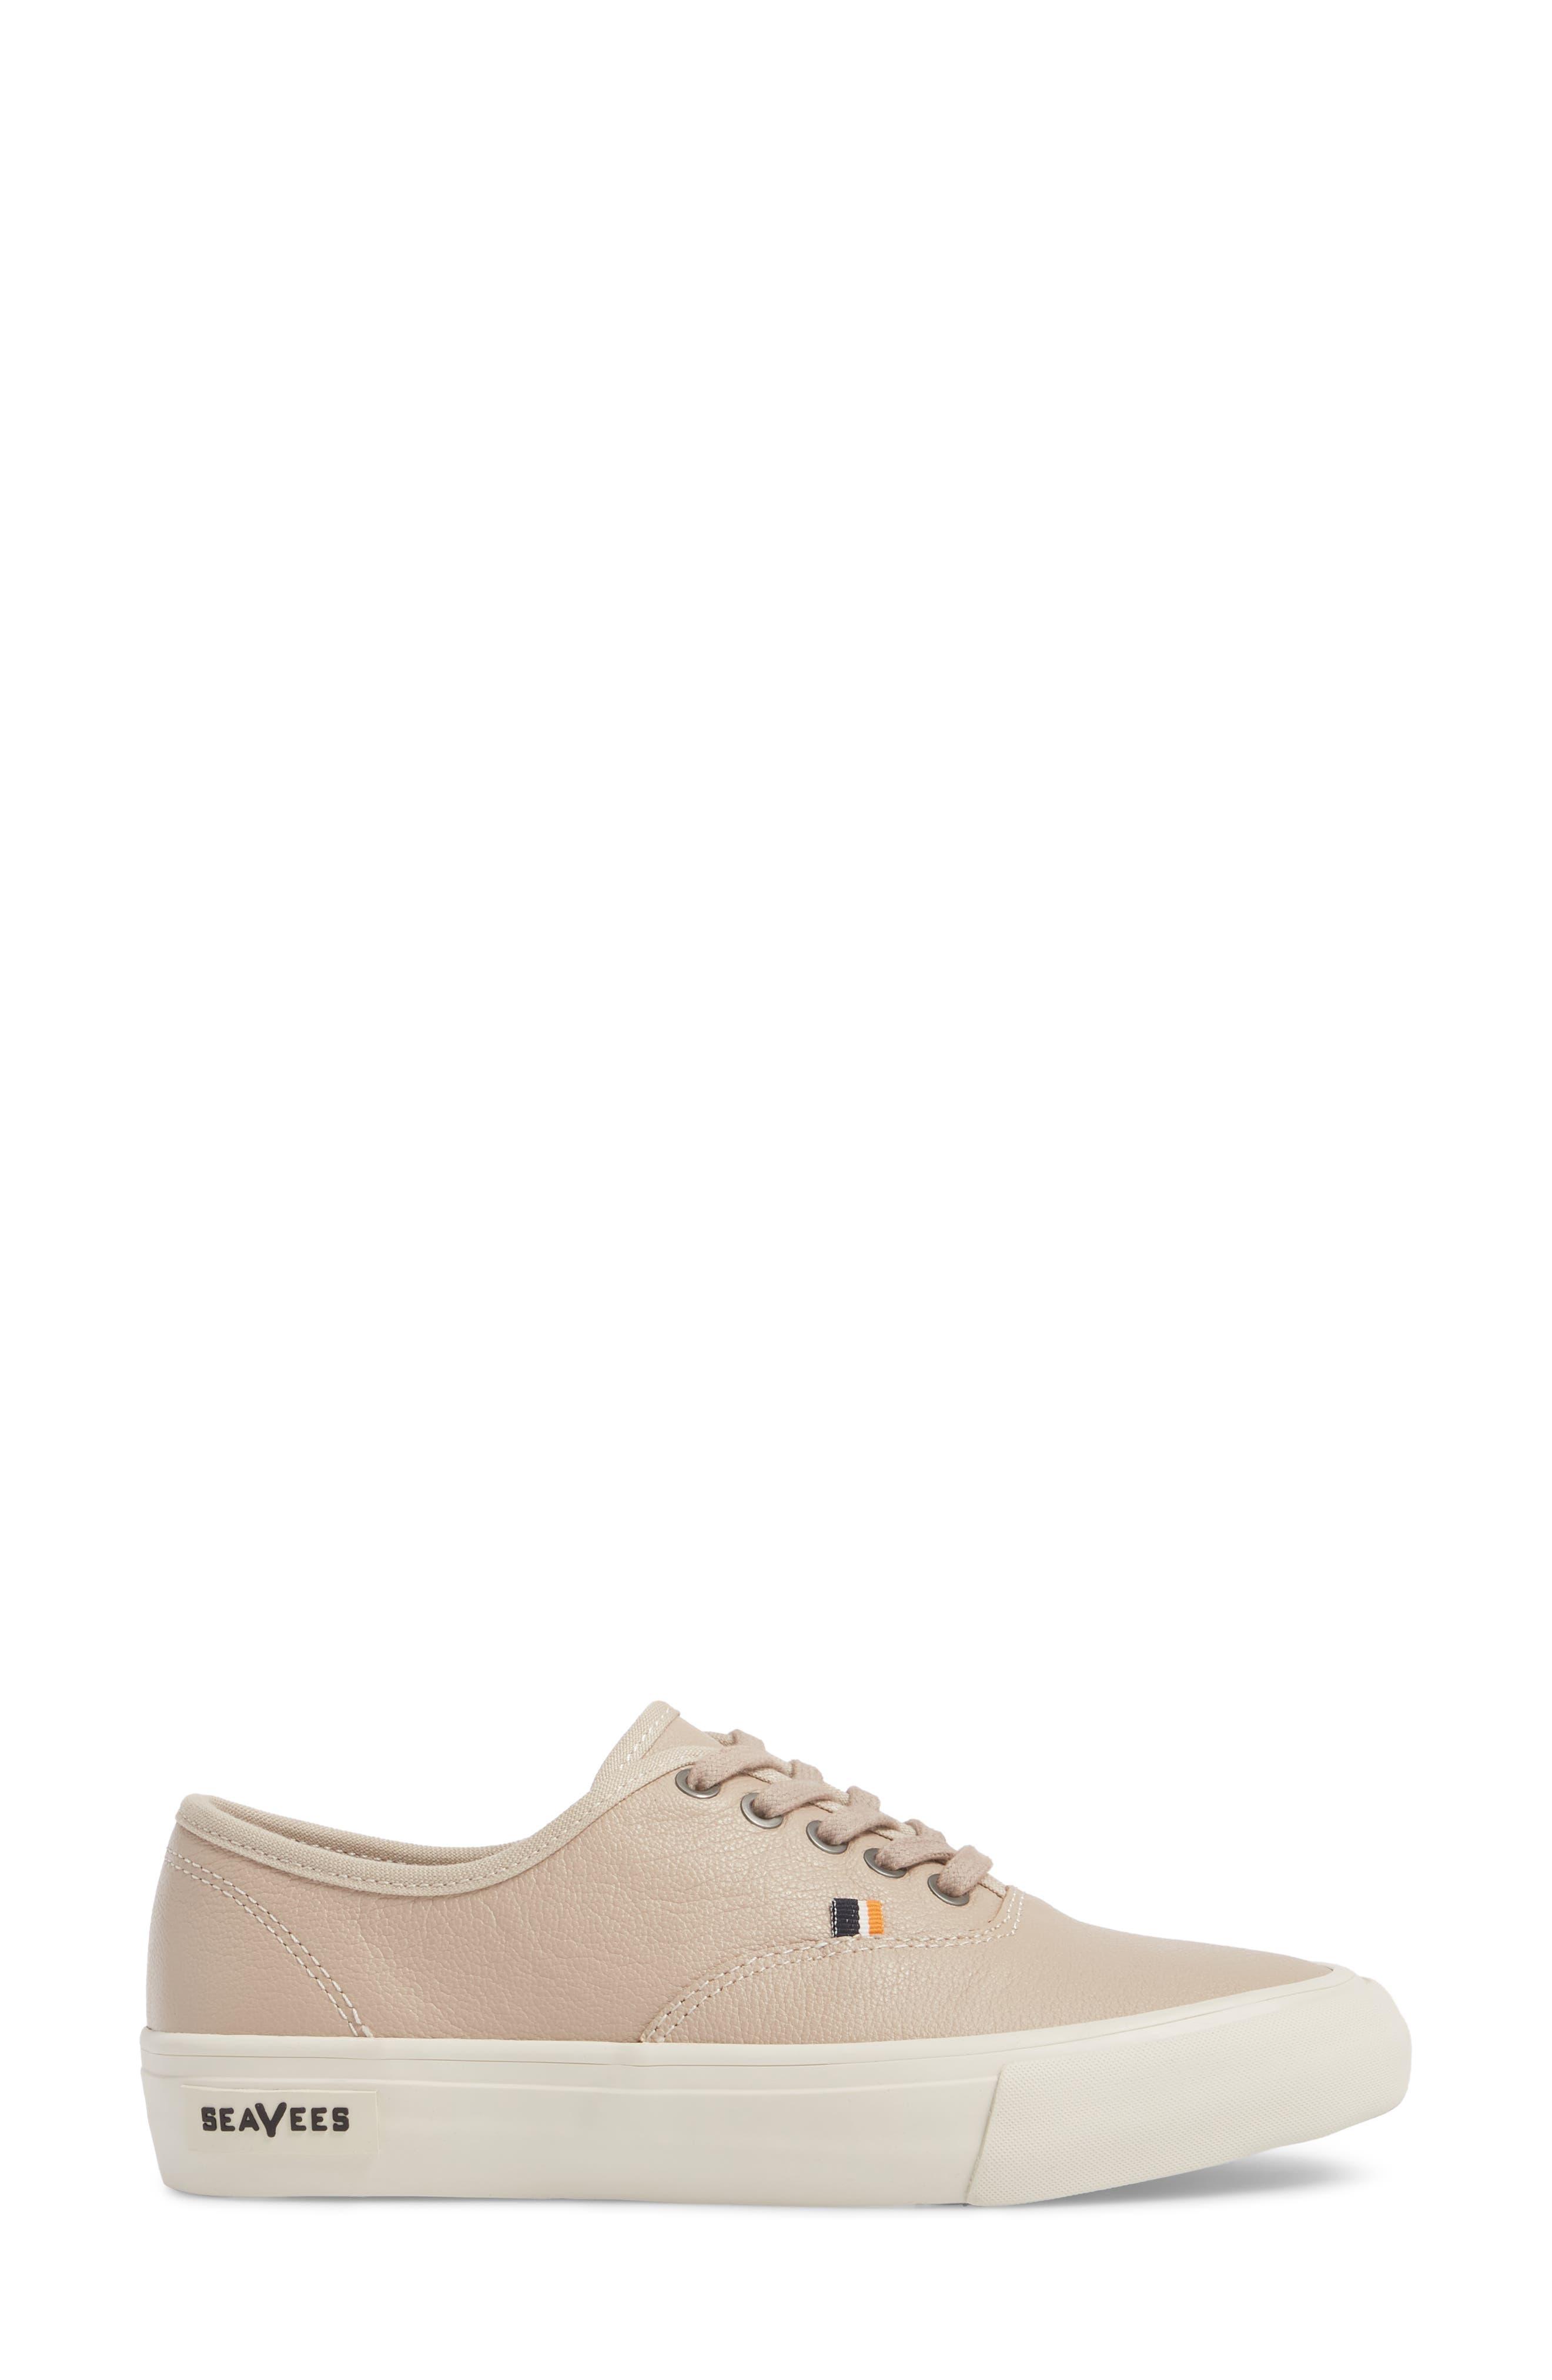 x Derek Lam 10 Crosby Legend Caballero Sneaker,                             Alternate thumbnail 3, color,                             BISQUE